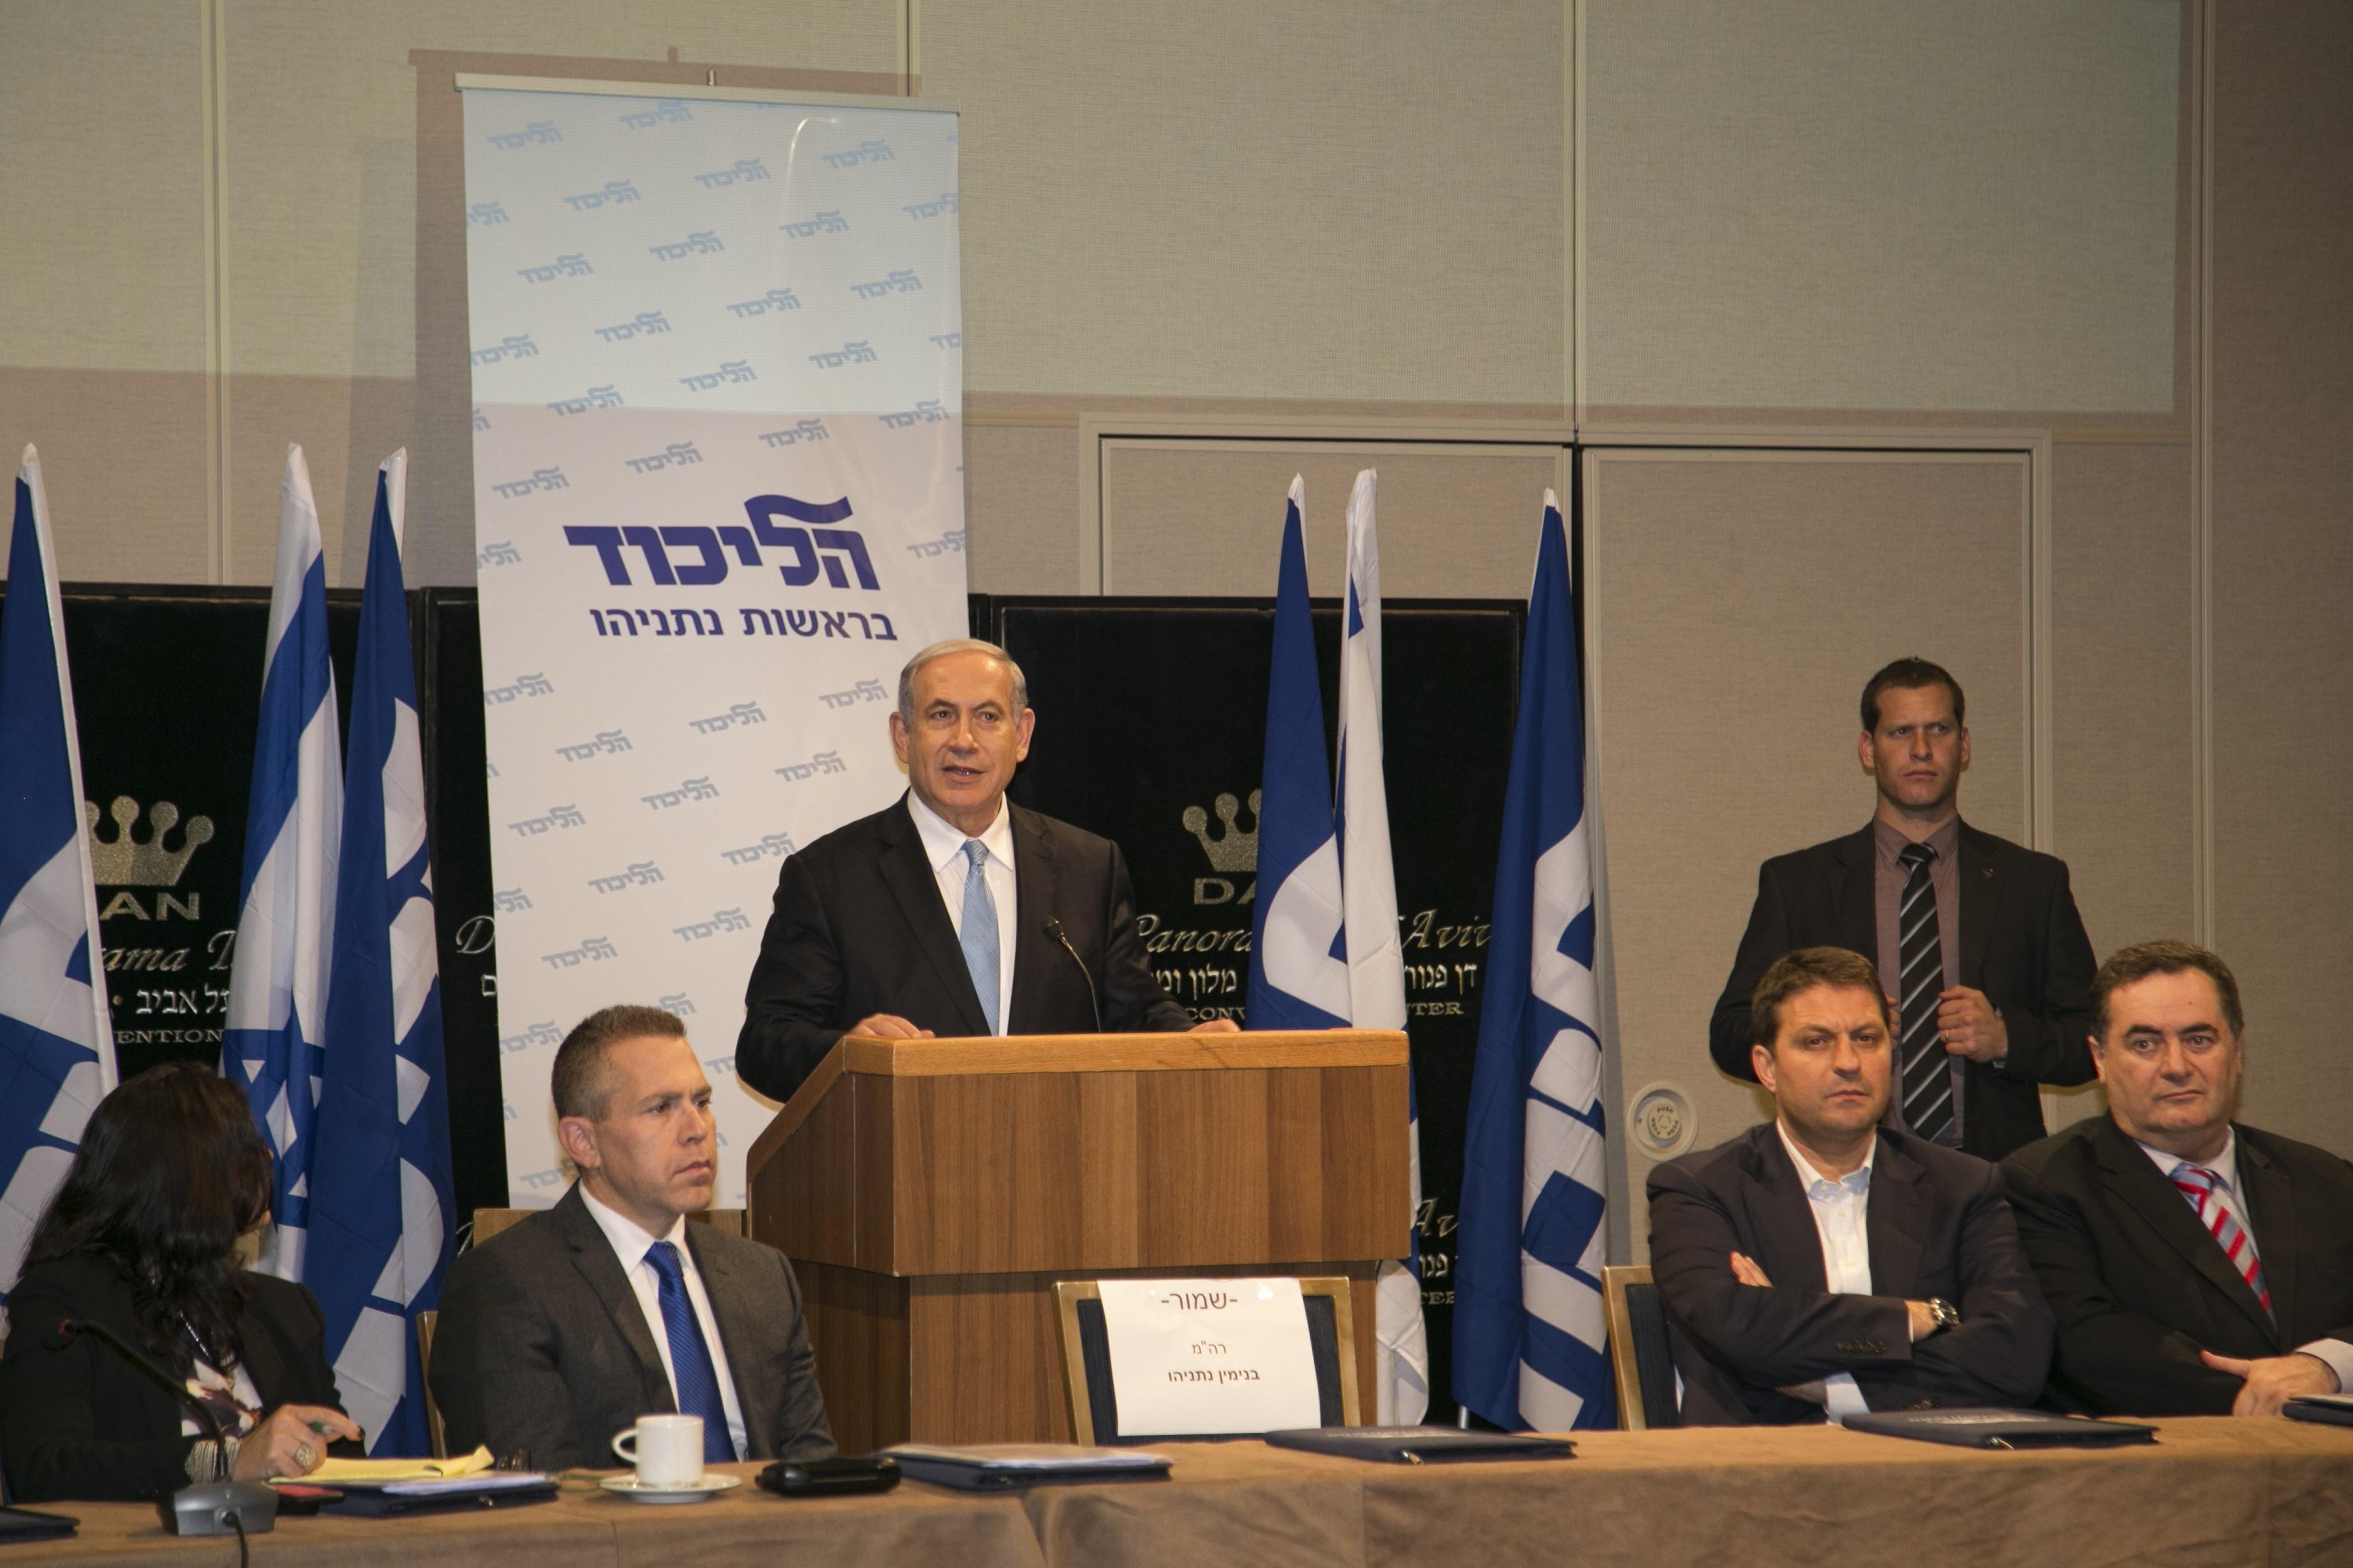 Tel Aviv, January 25, 2015 - Israeli Prime Minister Benjamin Netanyahu spoke during the launching campaign event of the Likud party - Image by © Dan Bar Dov/Demotix/Corbis